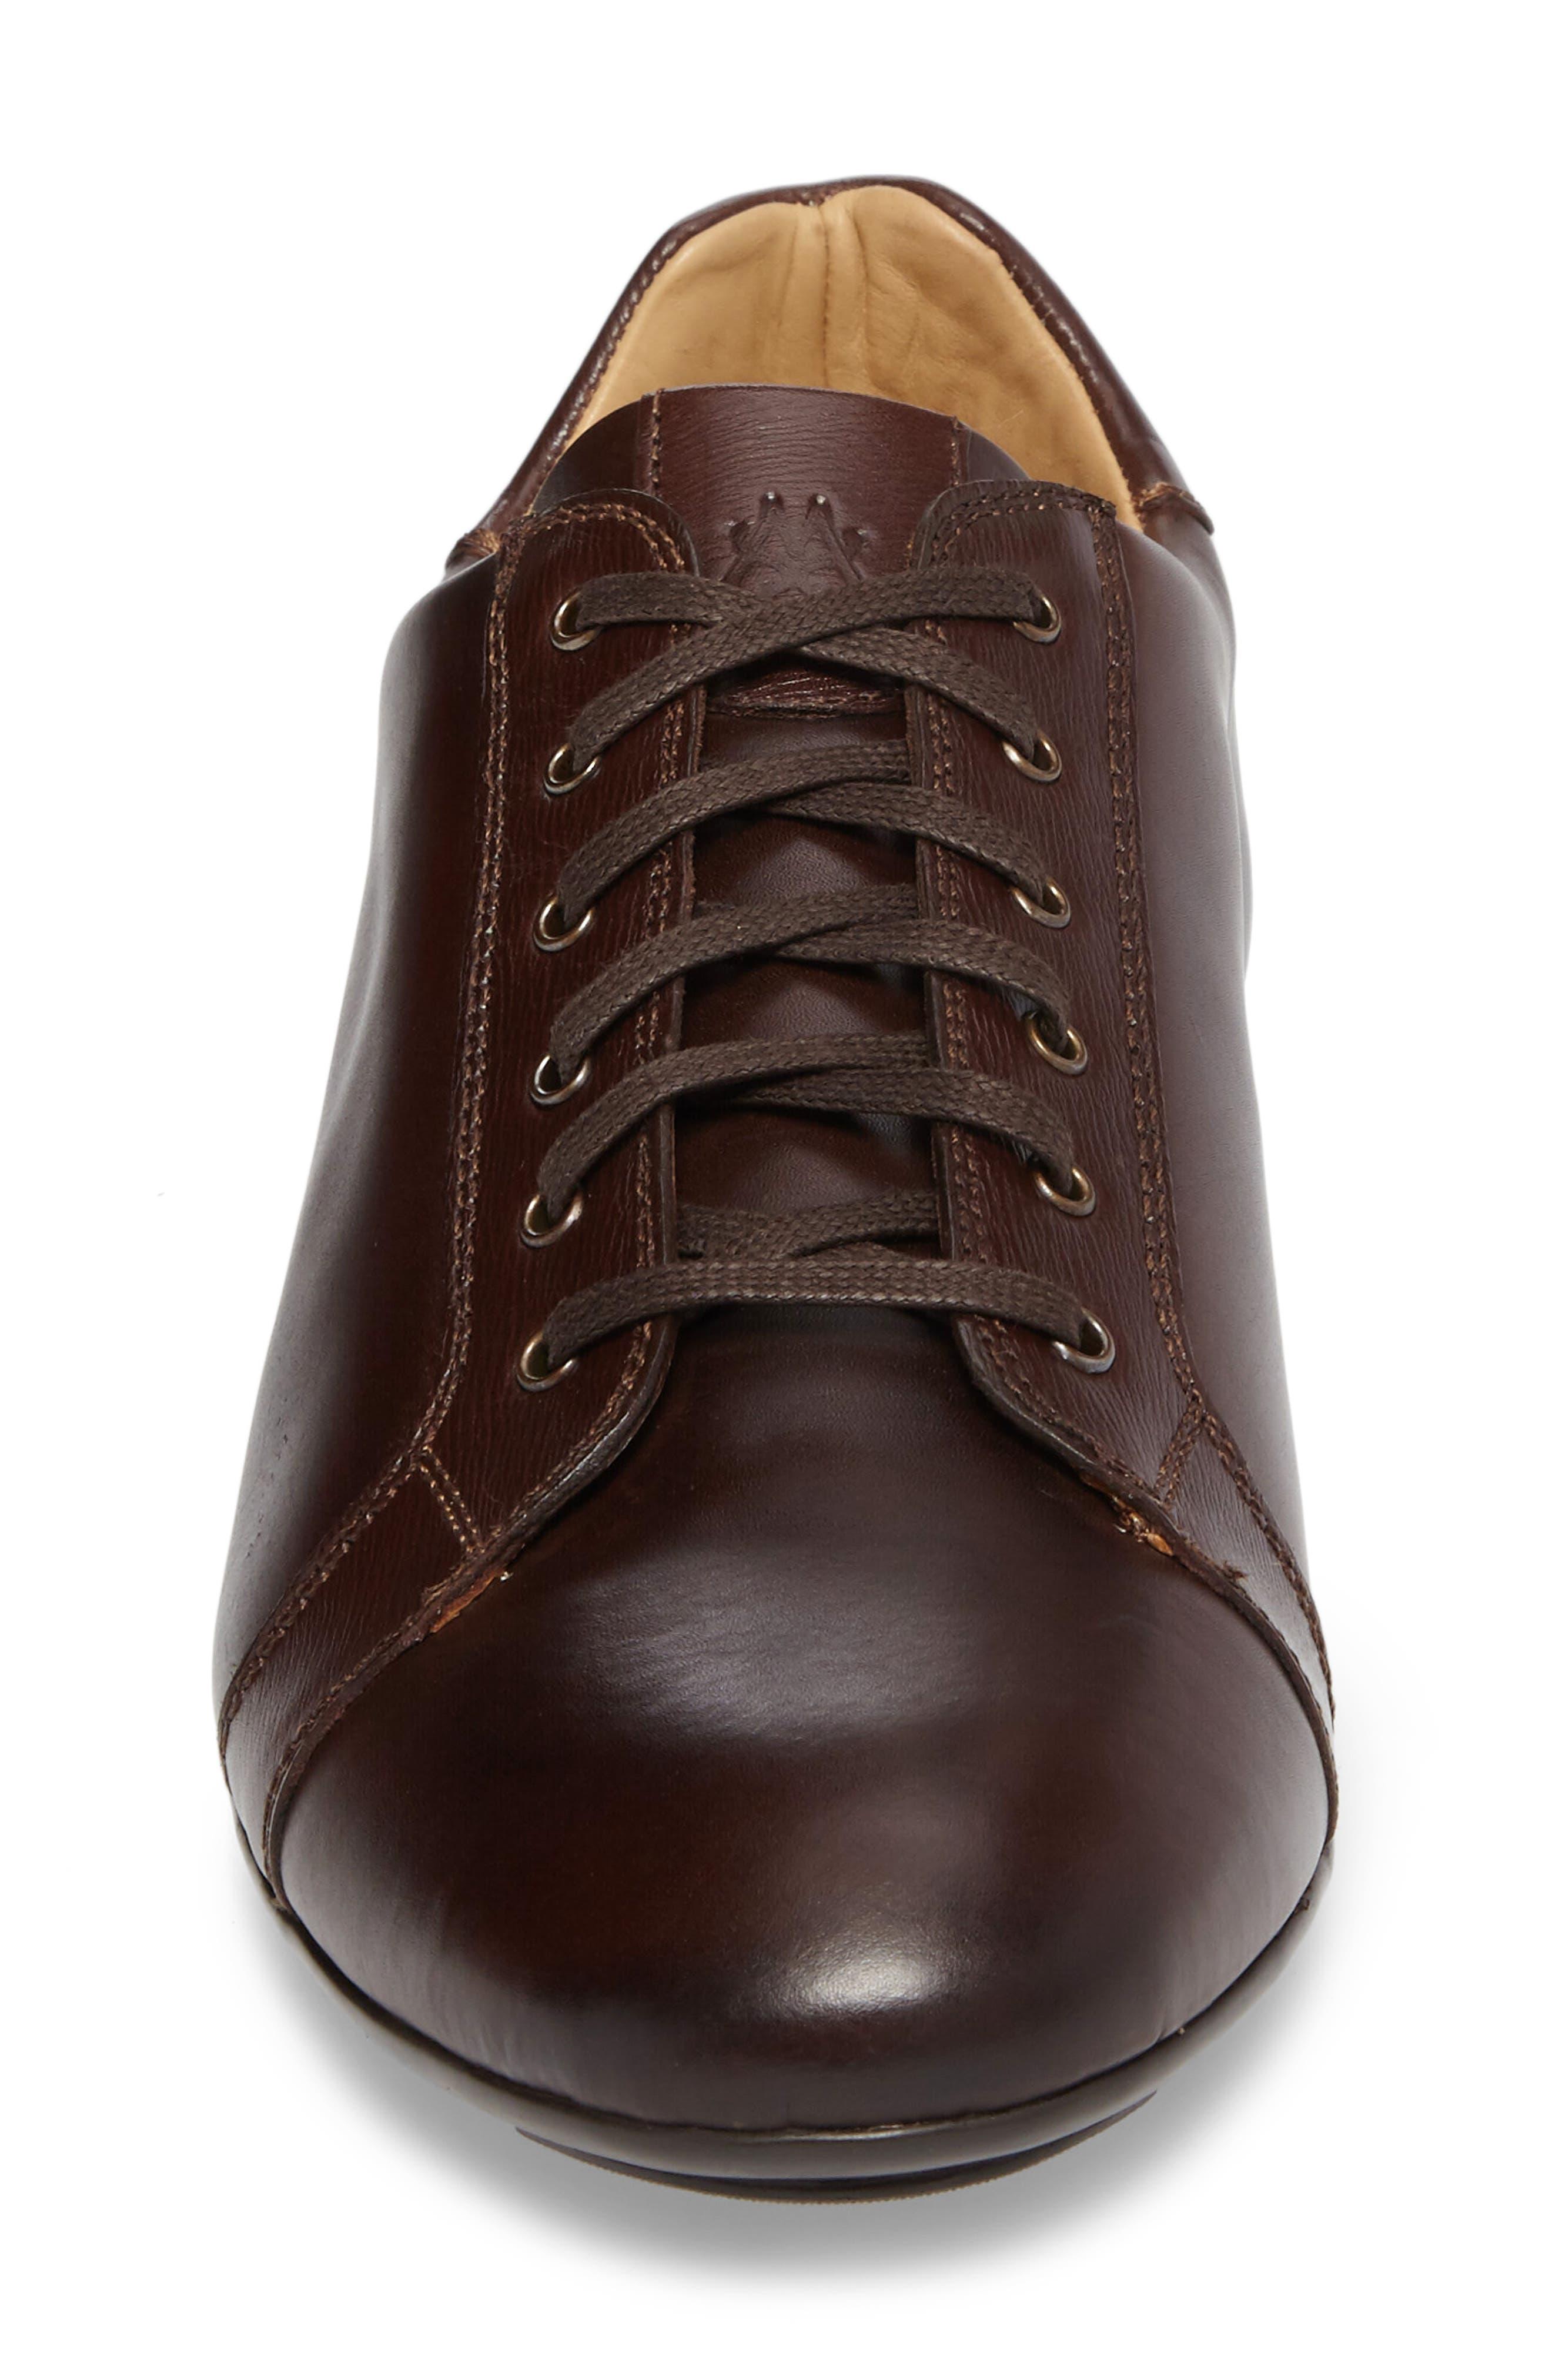 Ubrique Sneaker,                             Alternate thumbnail 4, color,                             Brown Multi Leather